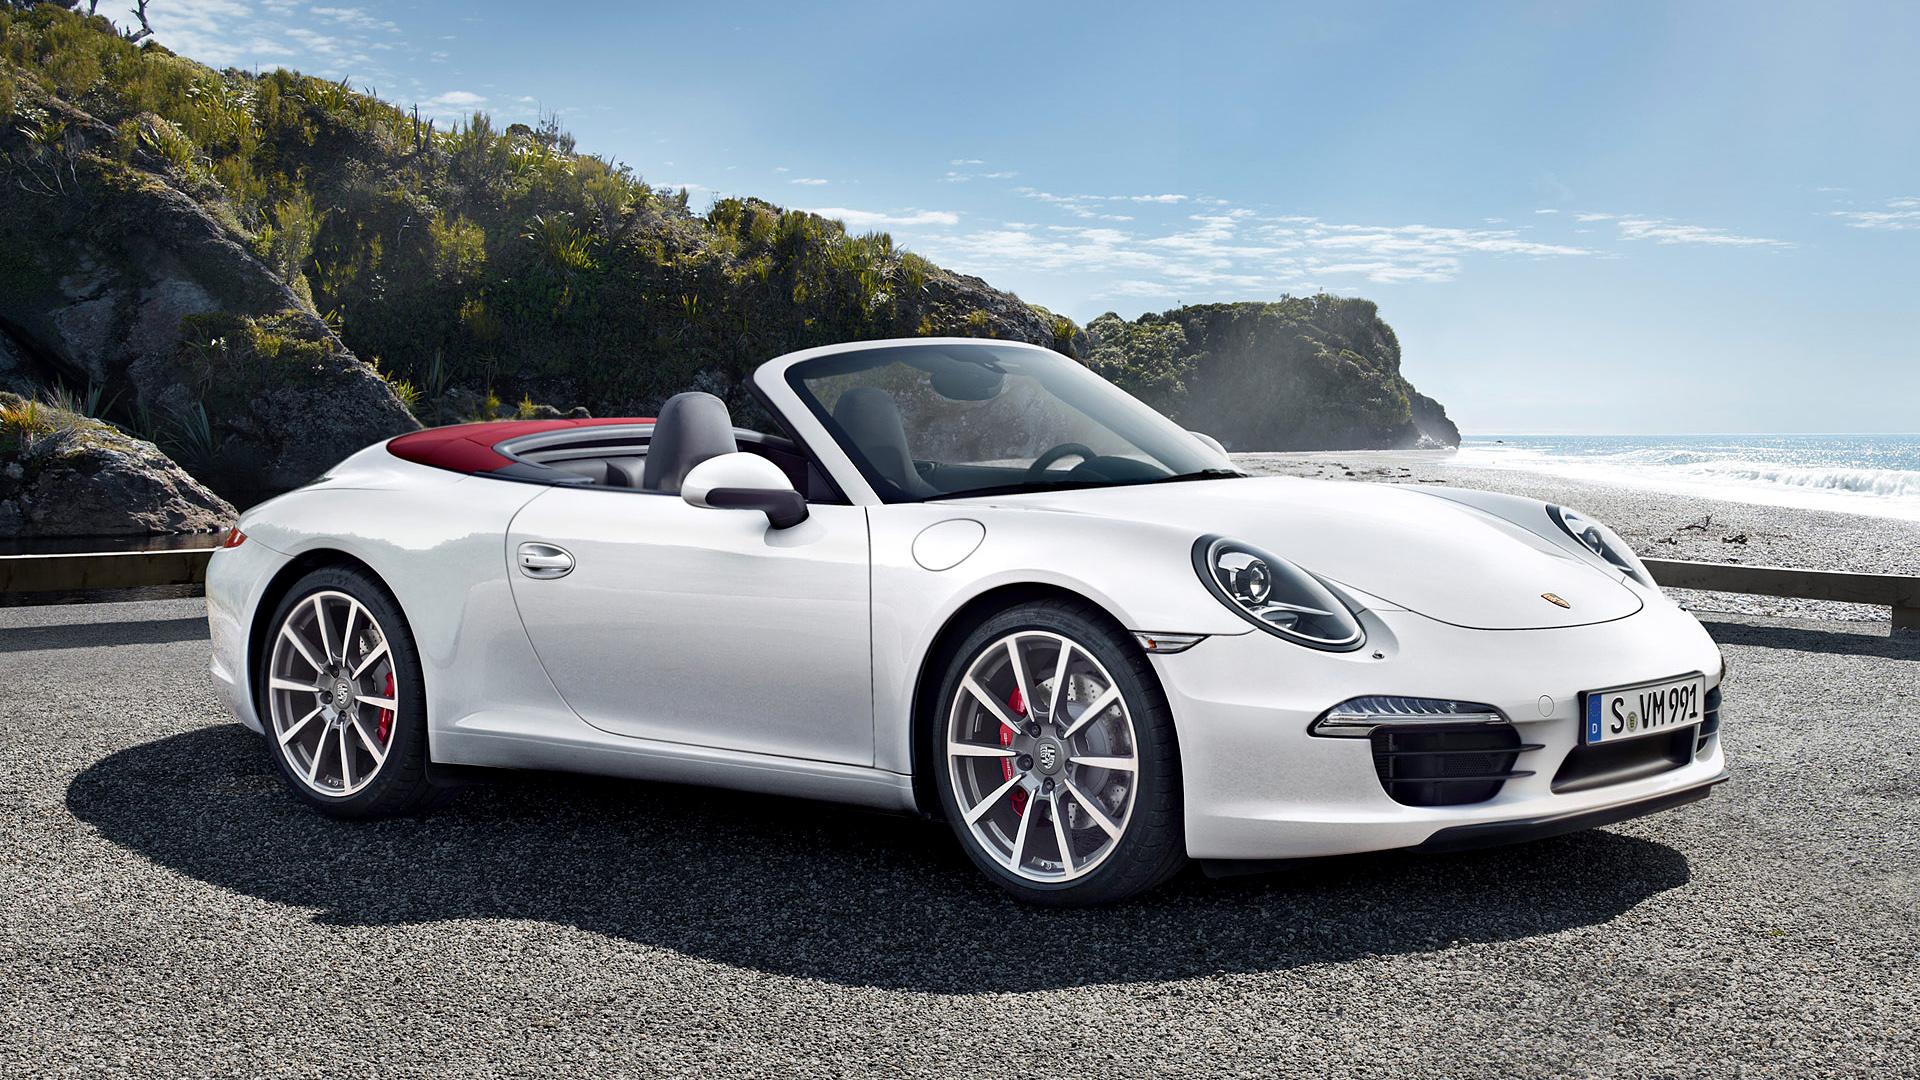 2013 Porsche 911 Carrera S Wallpapers HD Images   WSupercars 1920x1080